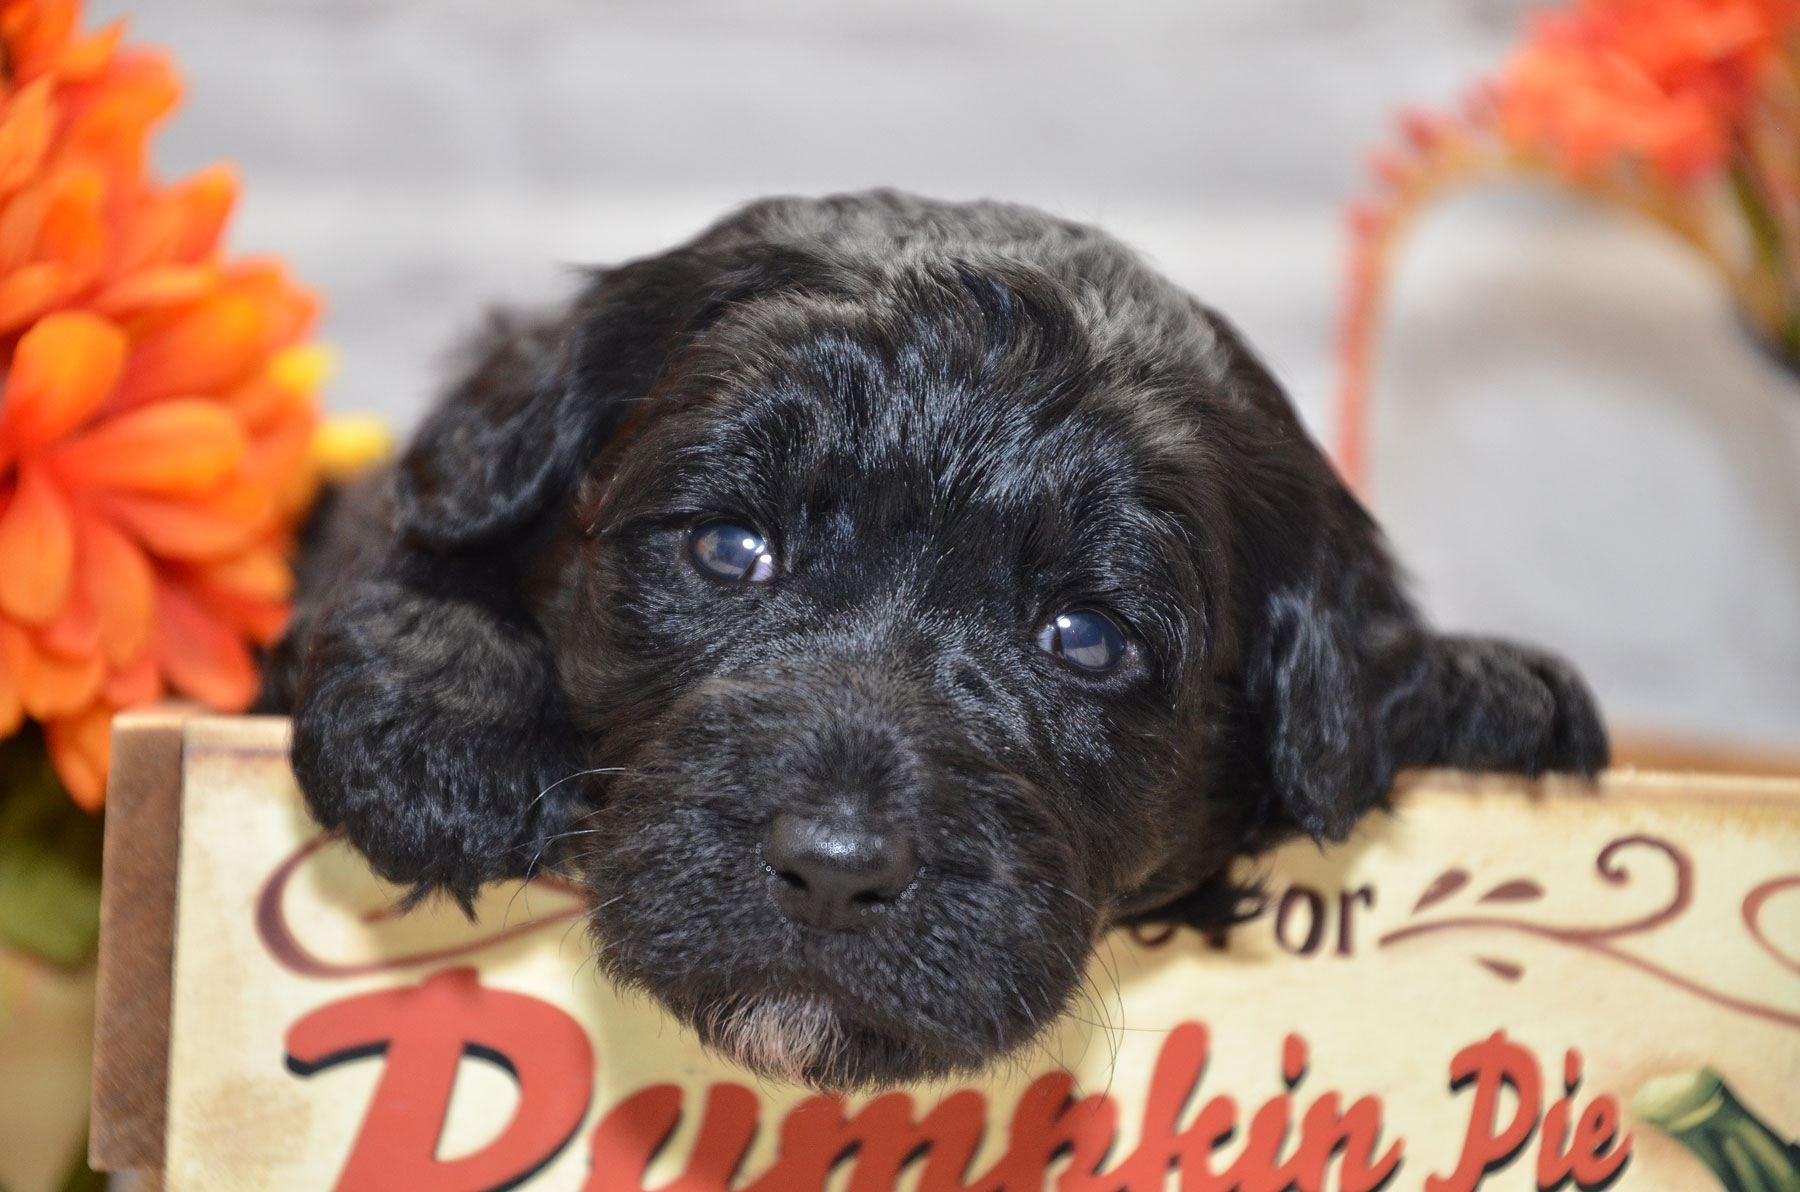 puppies-9-28-20_6673